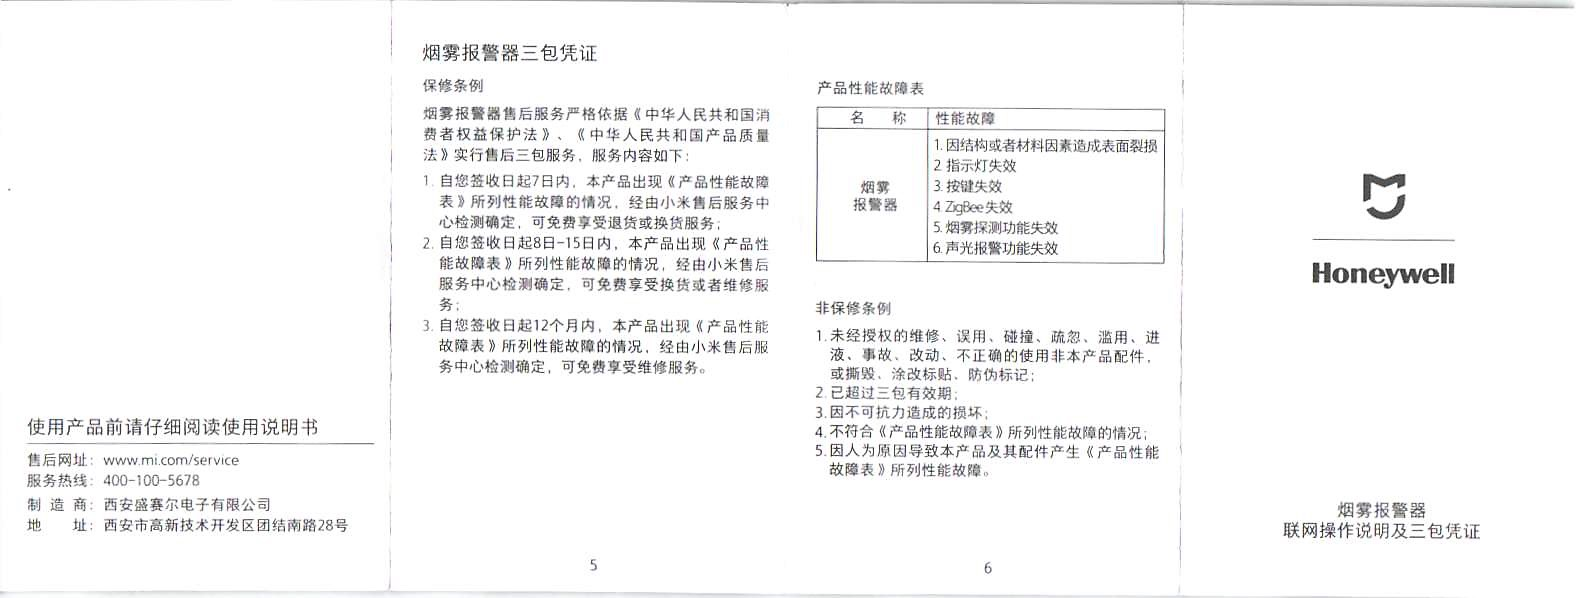 Xiaomi MiHome Honeywell Fire Smoke Alarm Detector Remote Alert Photoelectric Smoke Sensor 1